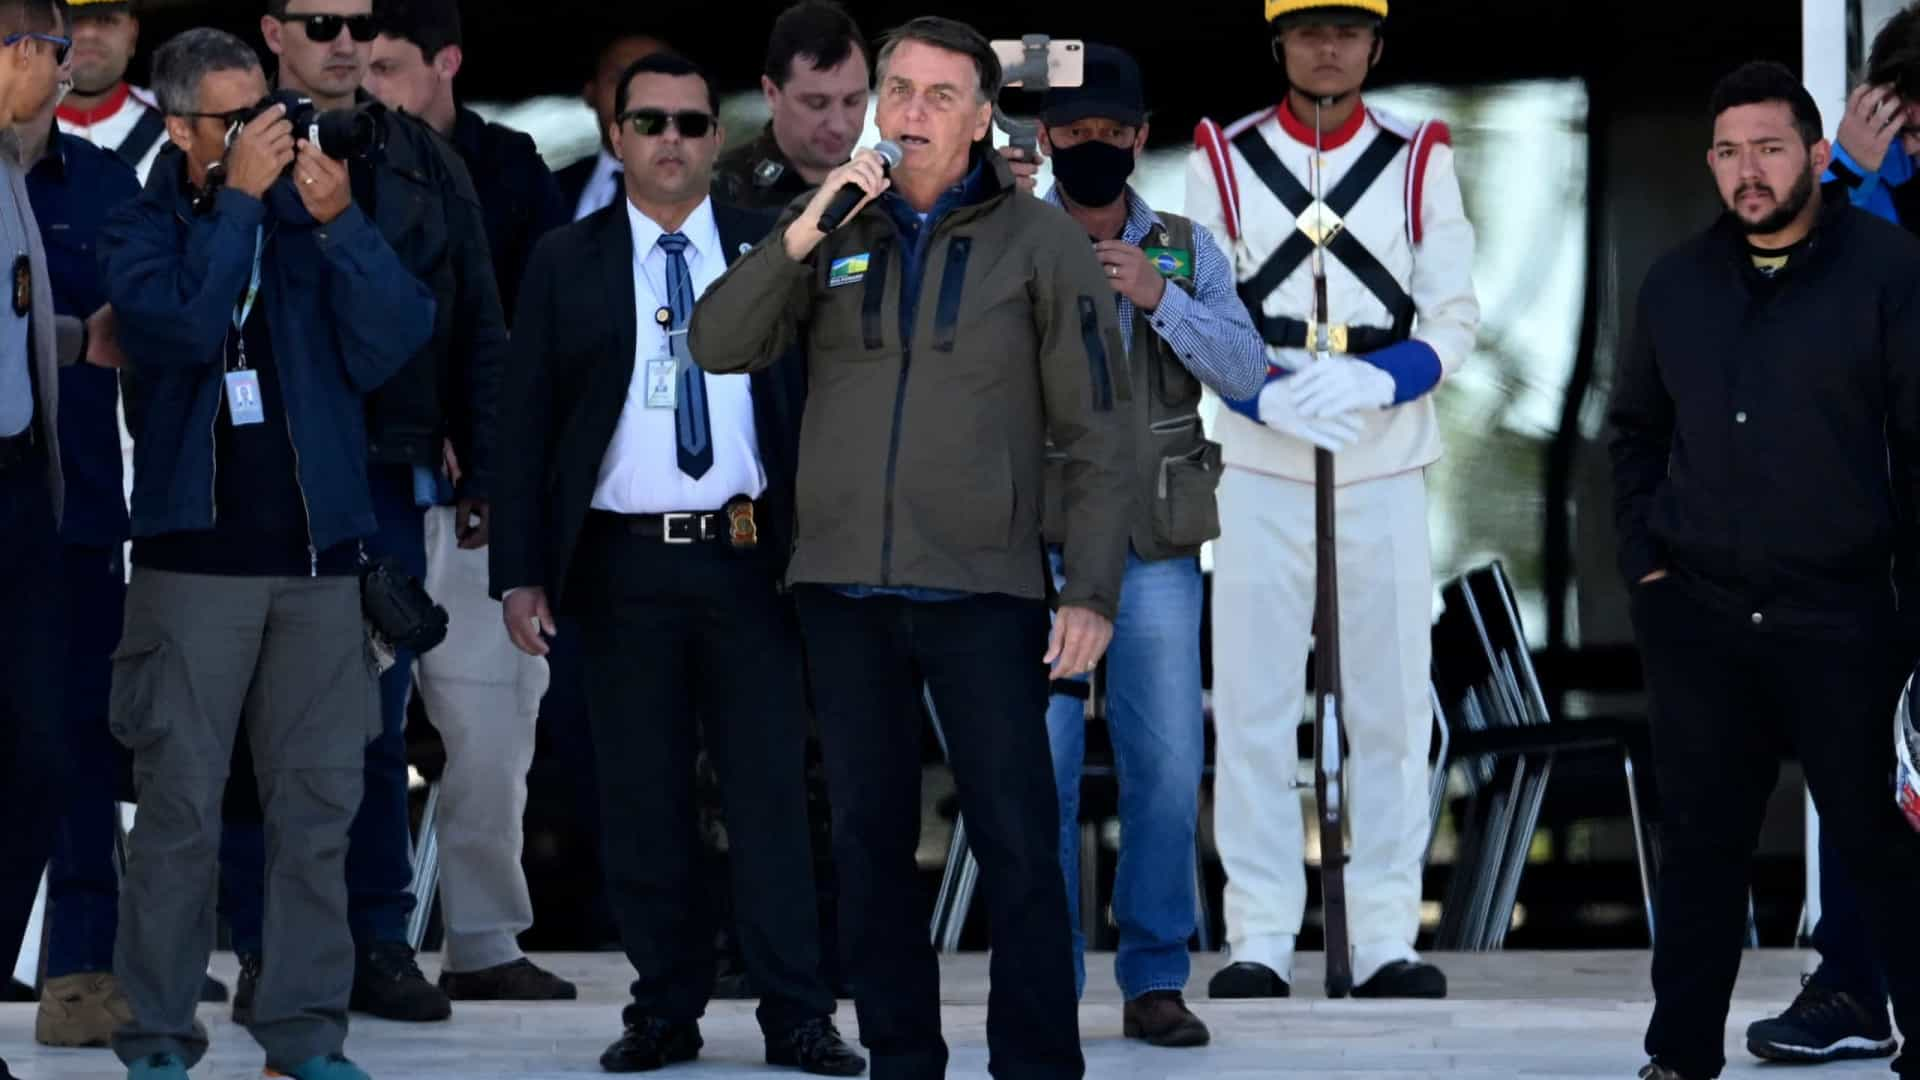 Bolsonaro se apresenta como 'chefe supremo' das Forças e chama presidentes de Poderes para ver blindados